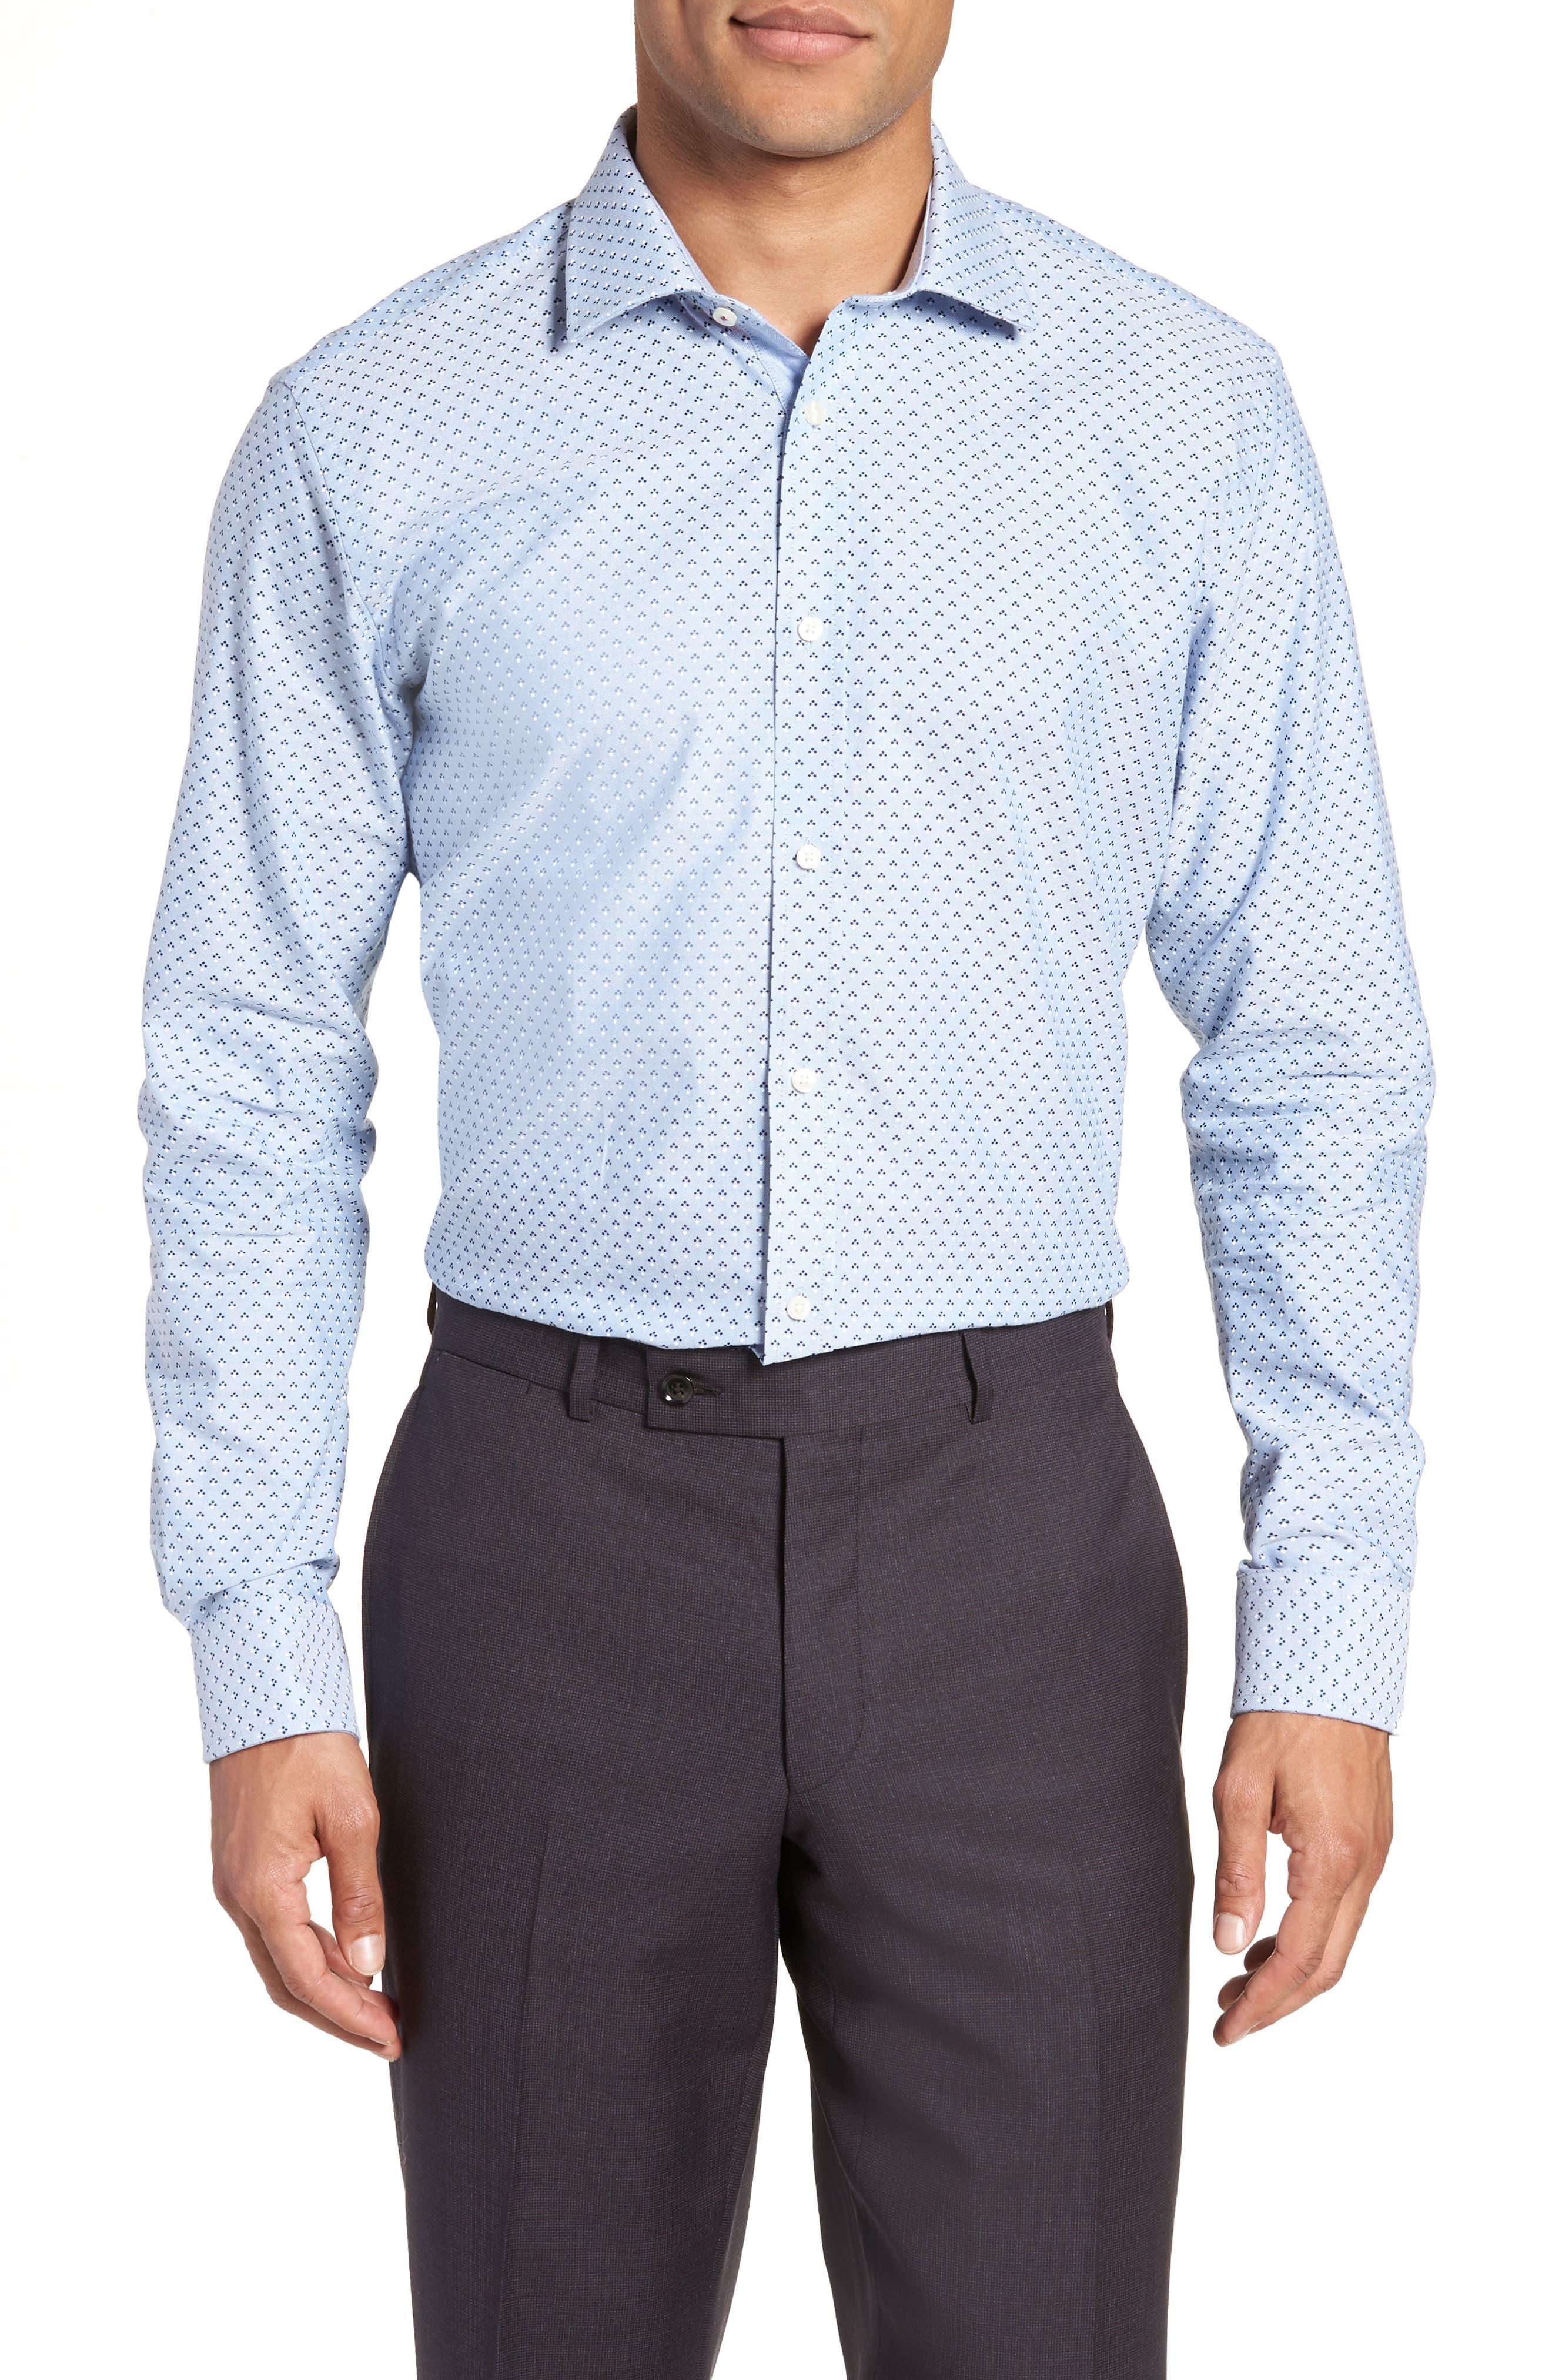 Forestr Trim Fit Geometric Dress Shirt,                             Main thumbnail 1, color,                             Blue